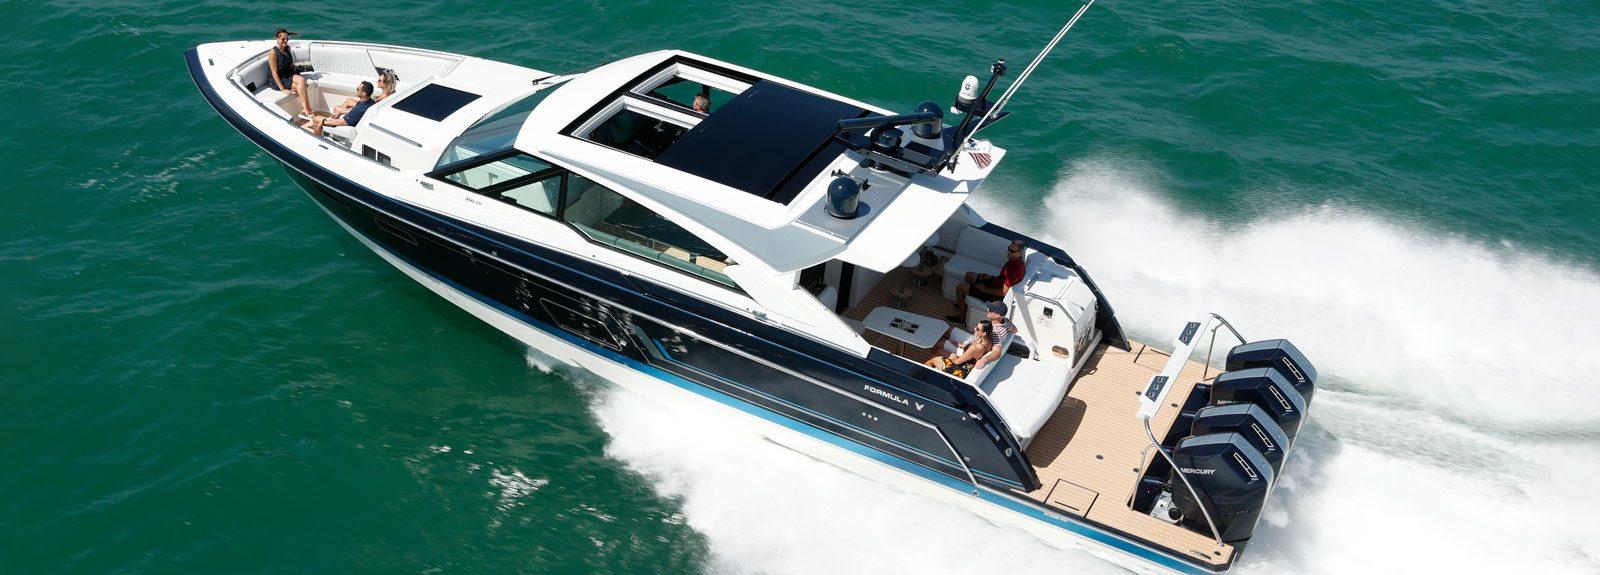 Offshore Lüks Motoryat-Yat Modelleri Formula